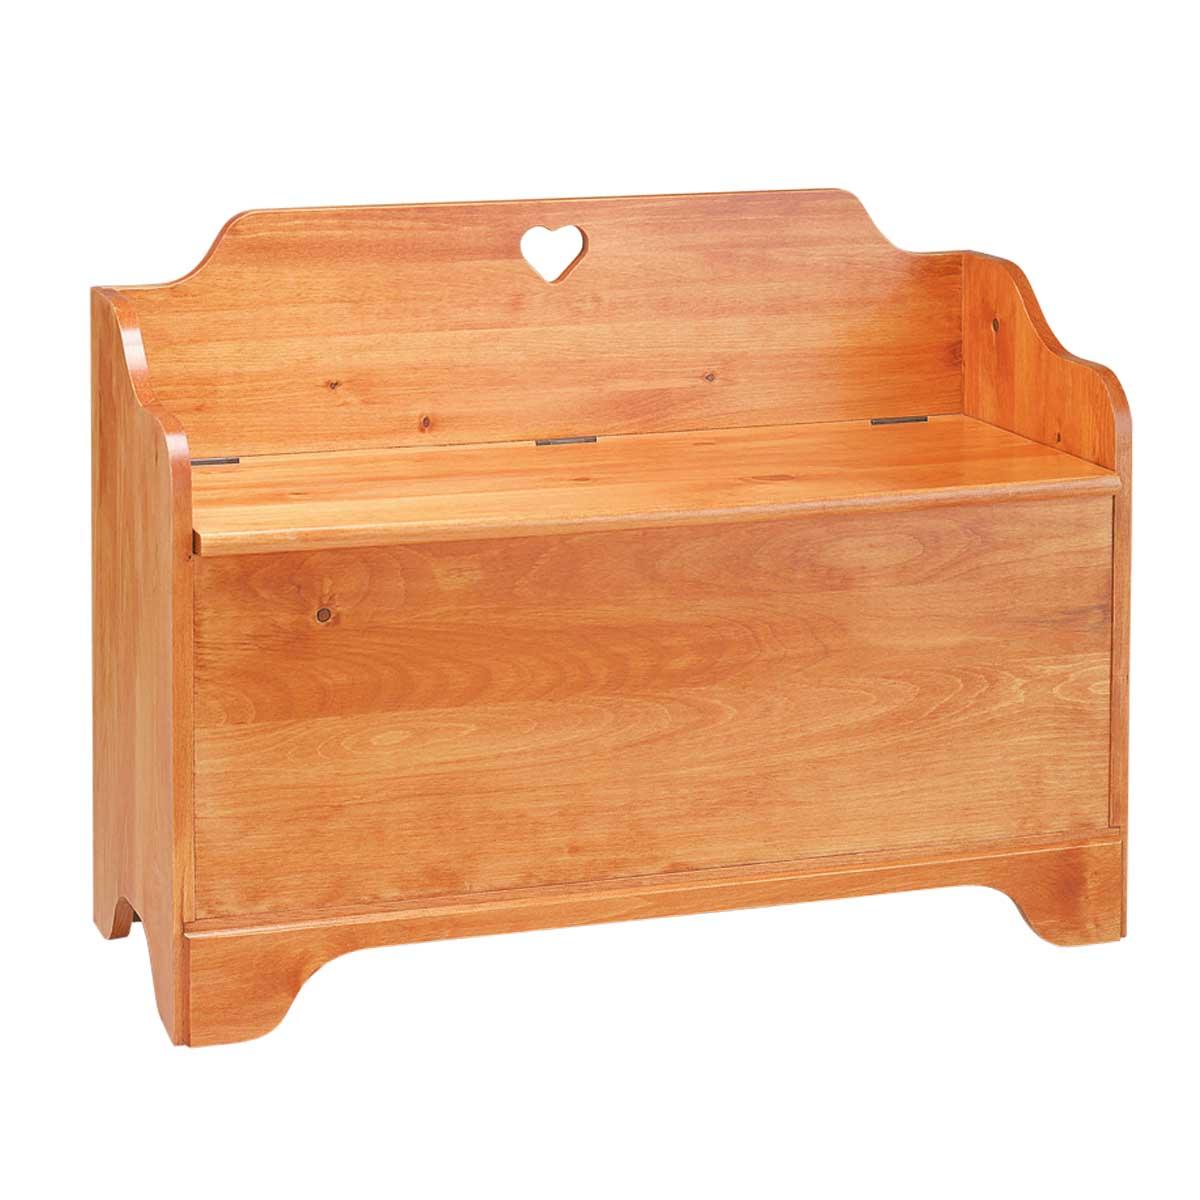 Linen Chest Heirloom Pine Heart Chest Bench   Renovator's Supply